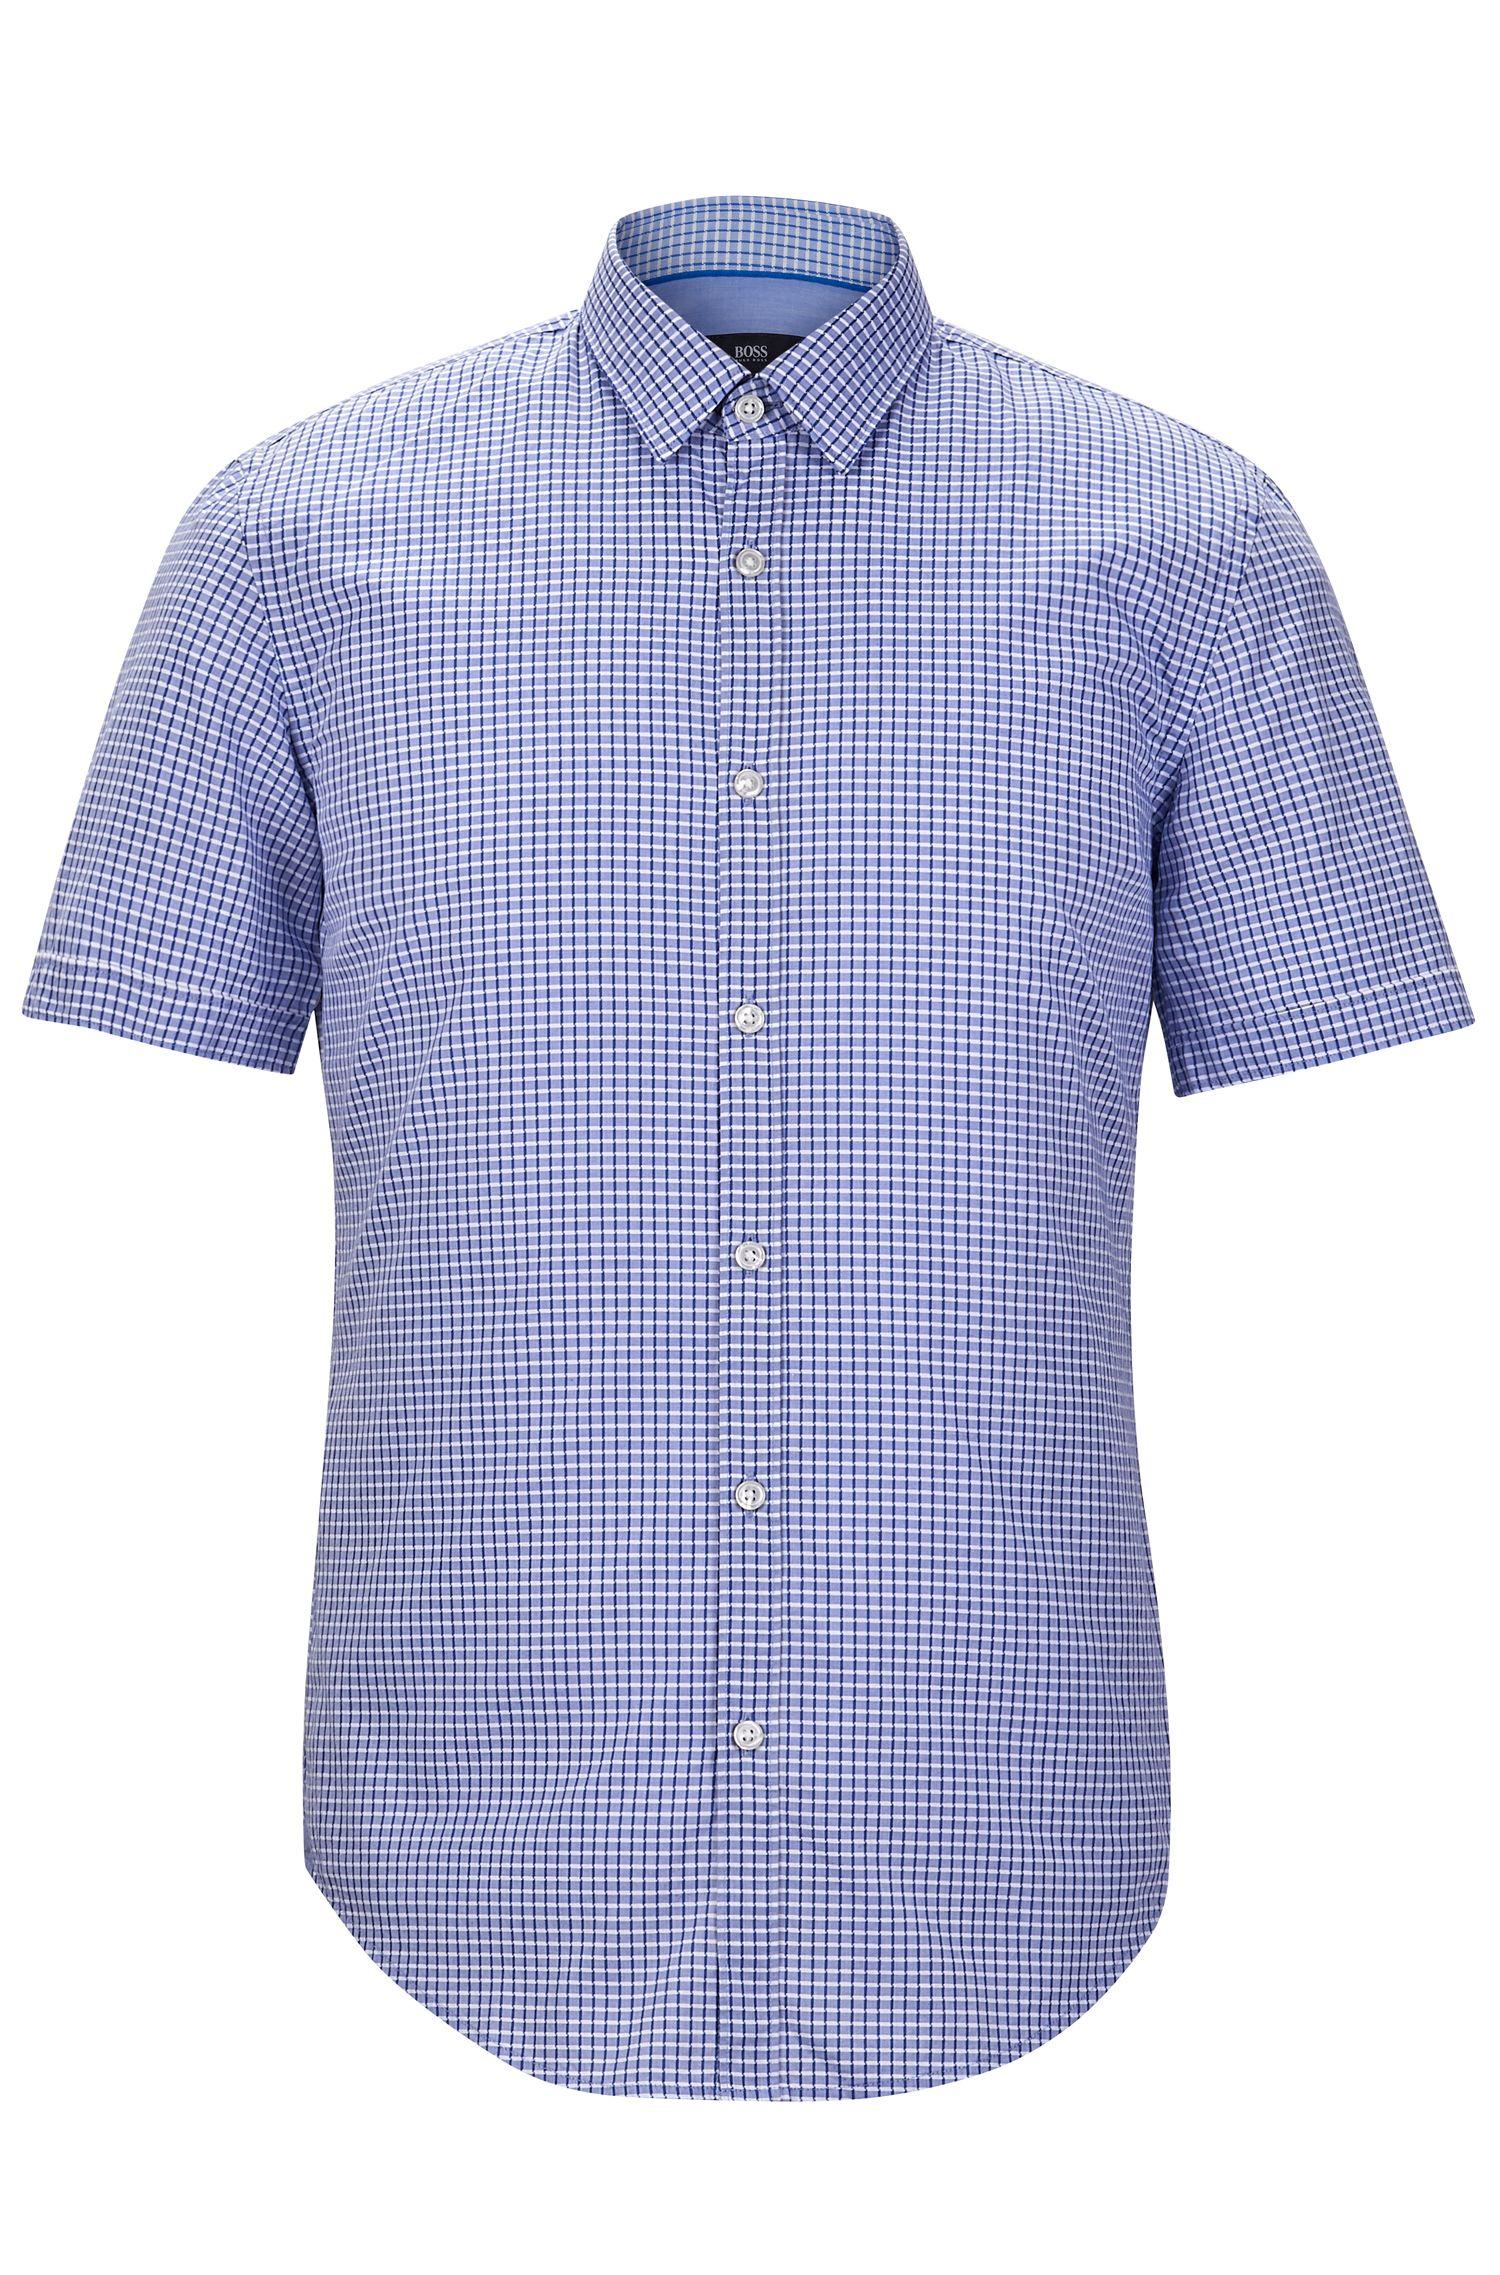 'Ronn' | Slim Fit, Check Garment Washed Cotton Blend Button-Down Shirt